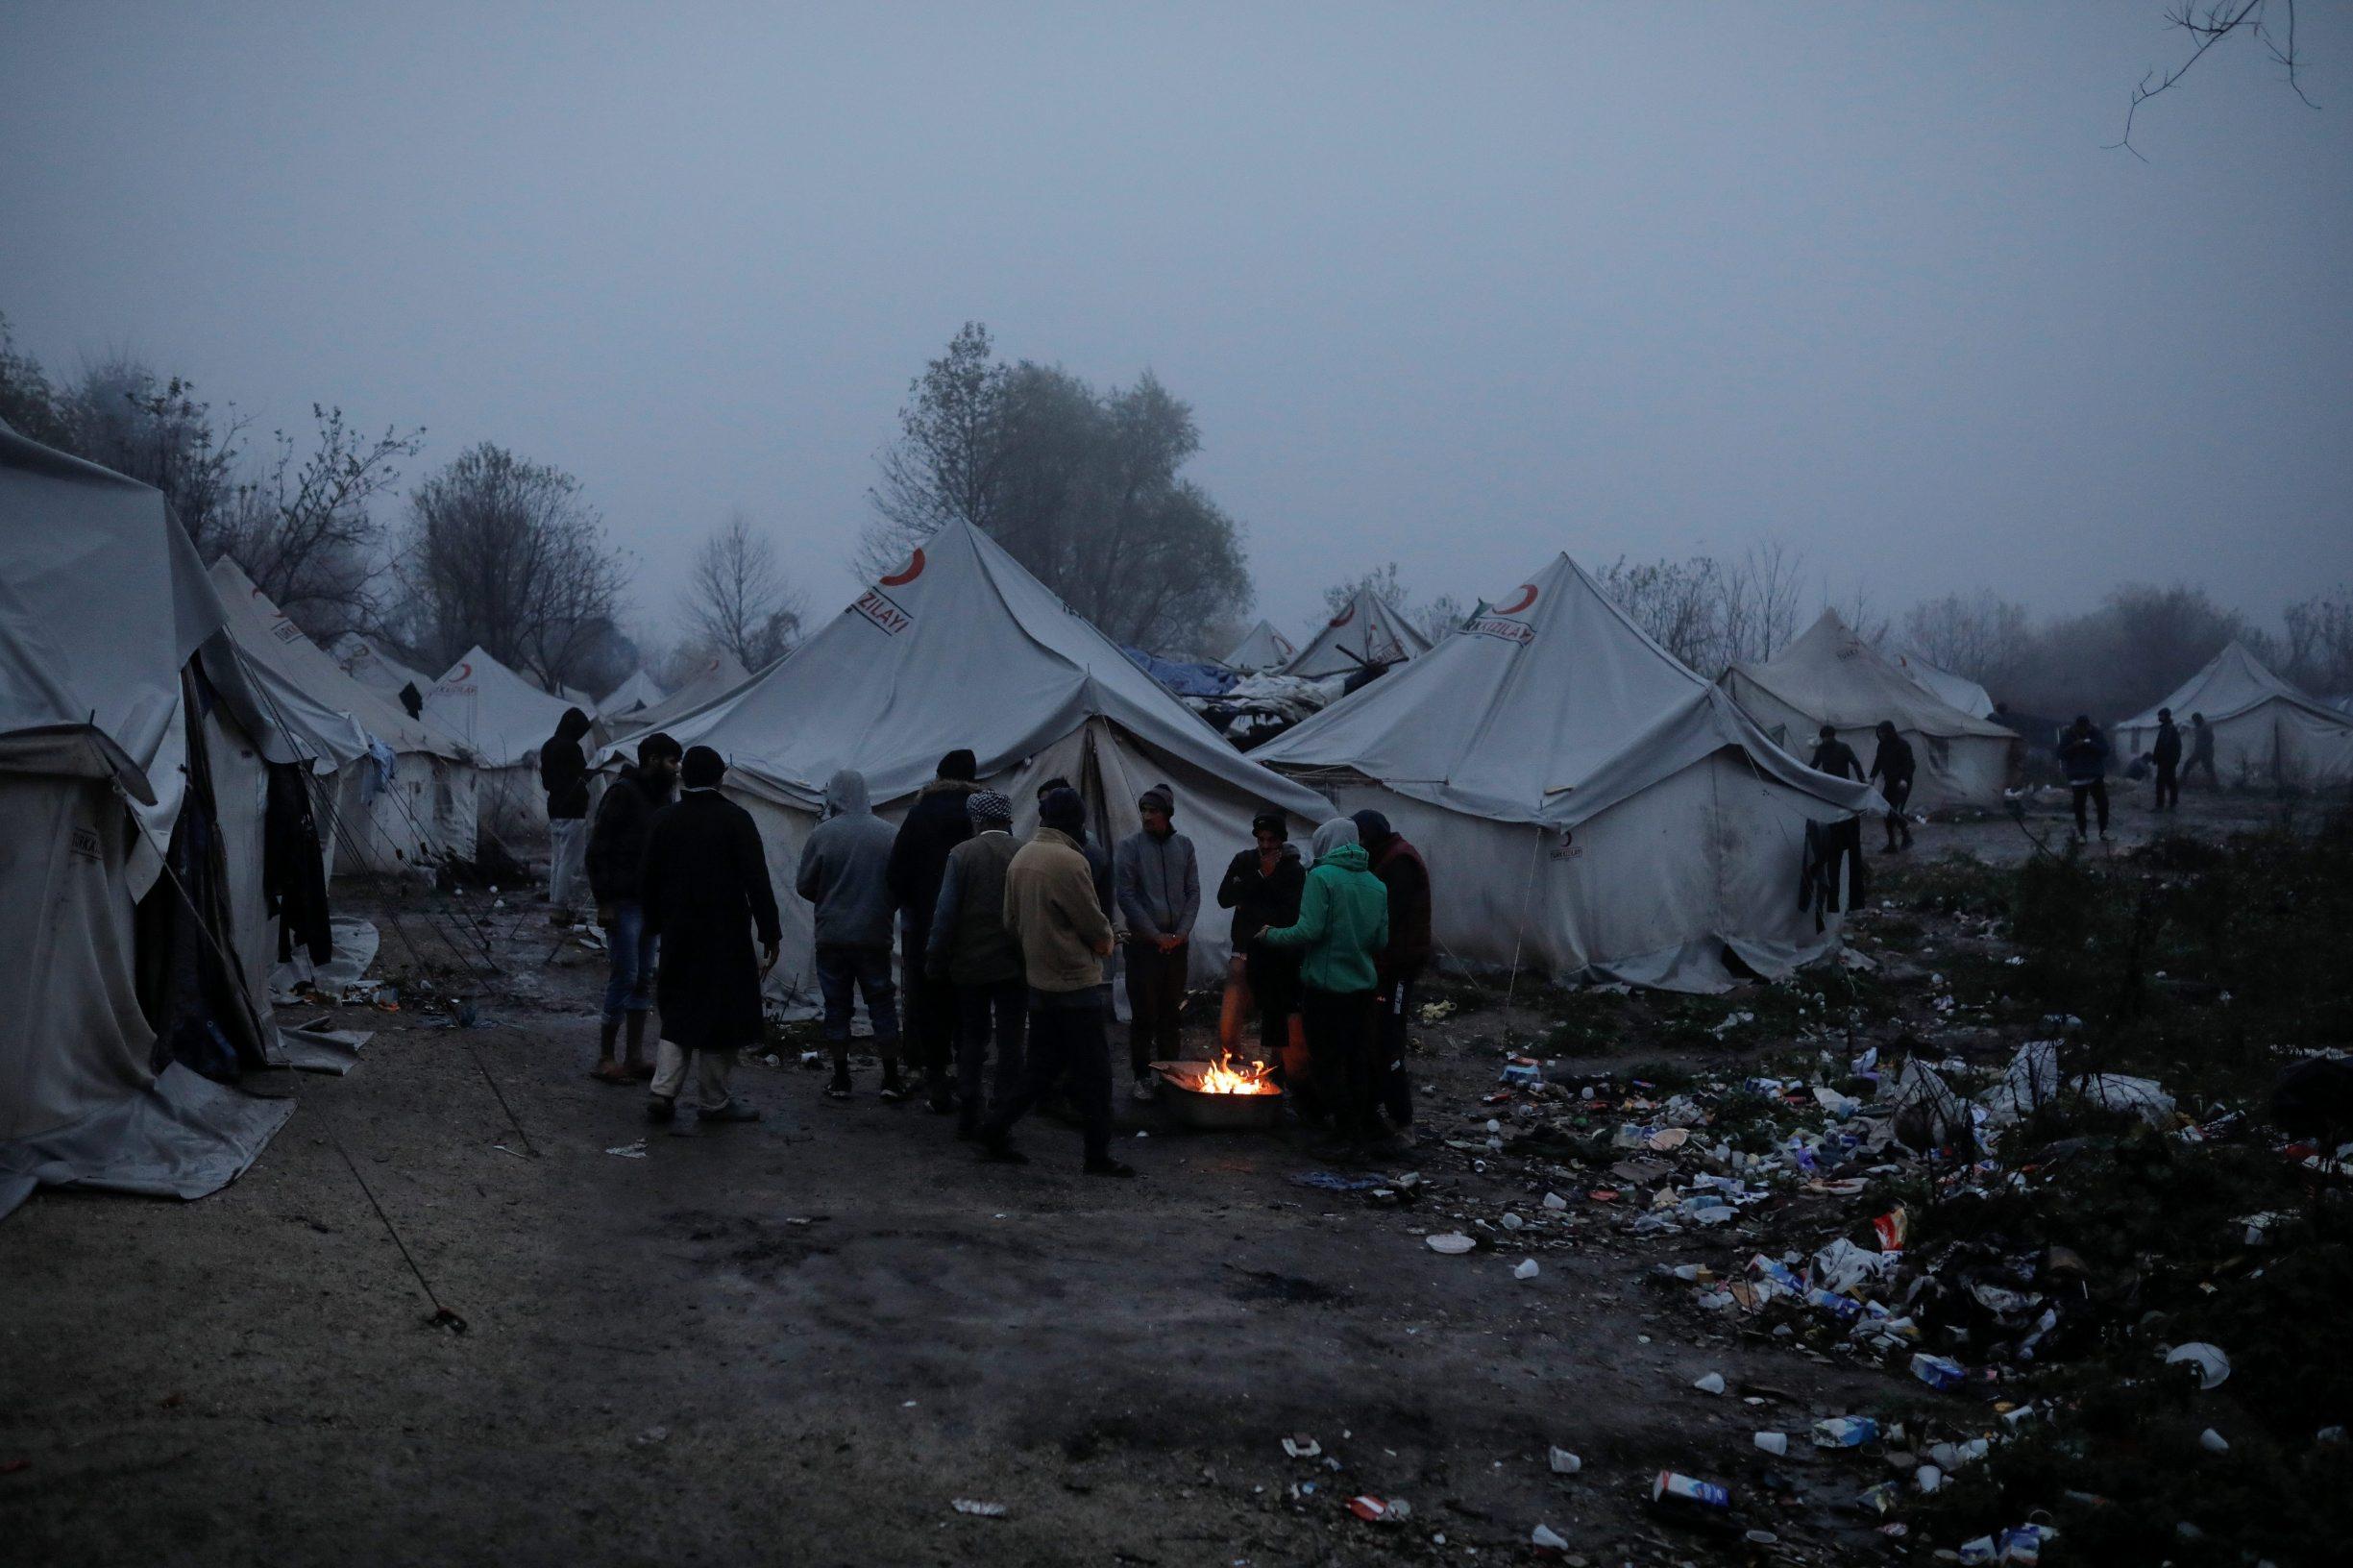 Migrants warm themselves by the fire inside Vucjak camp near Bihac, Bosnia and Herzegovina, November 14, 2019. REUTERS/Marko Djurica